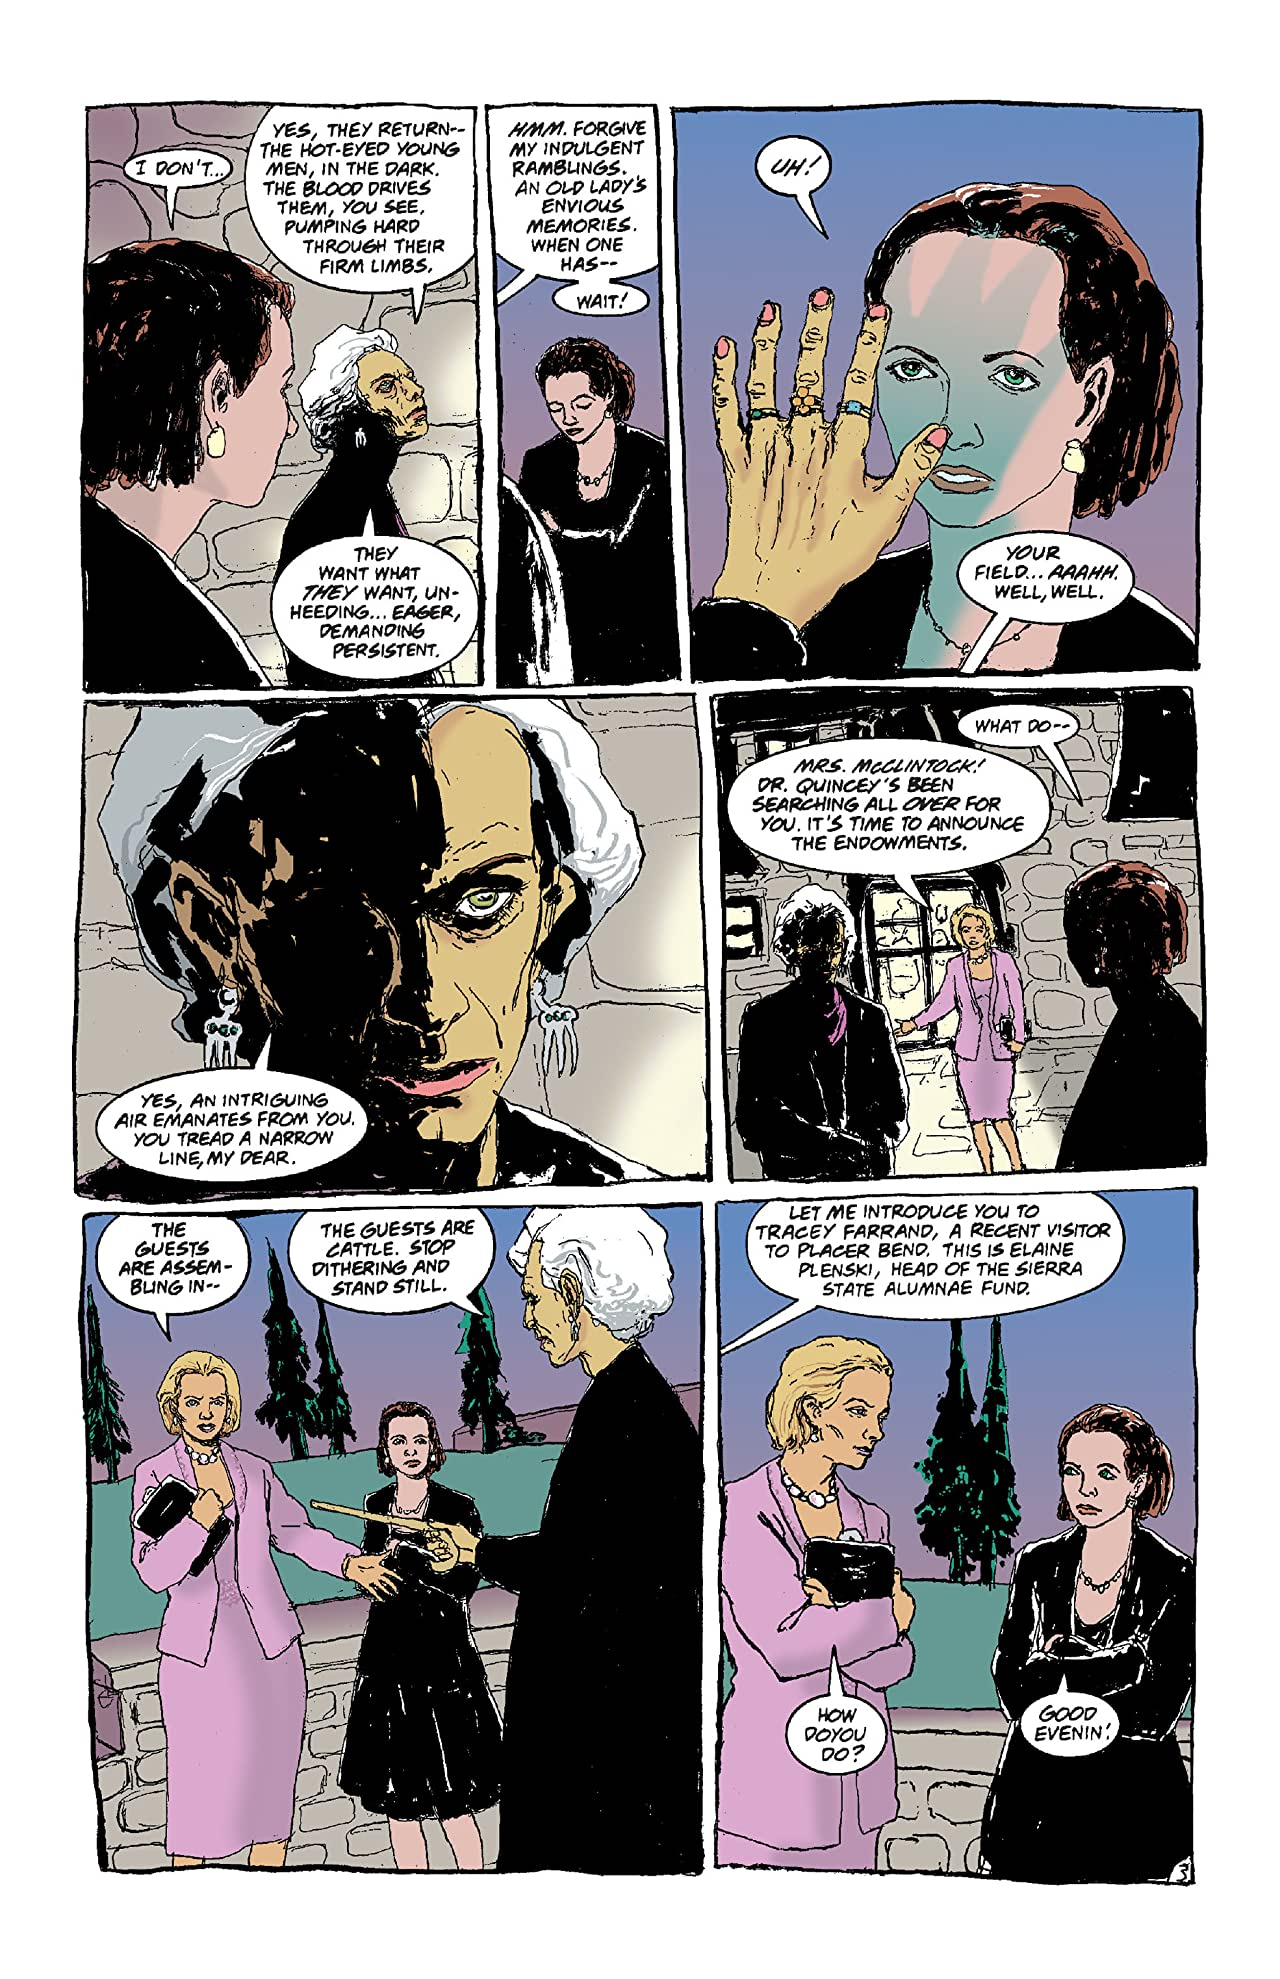 Fault Lines (1997) #4